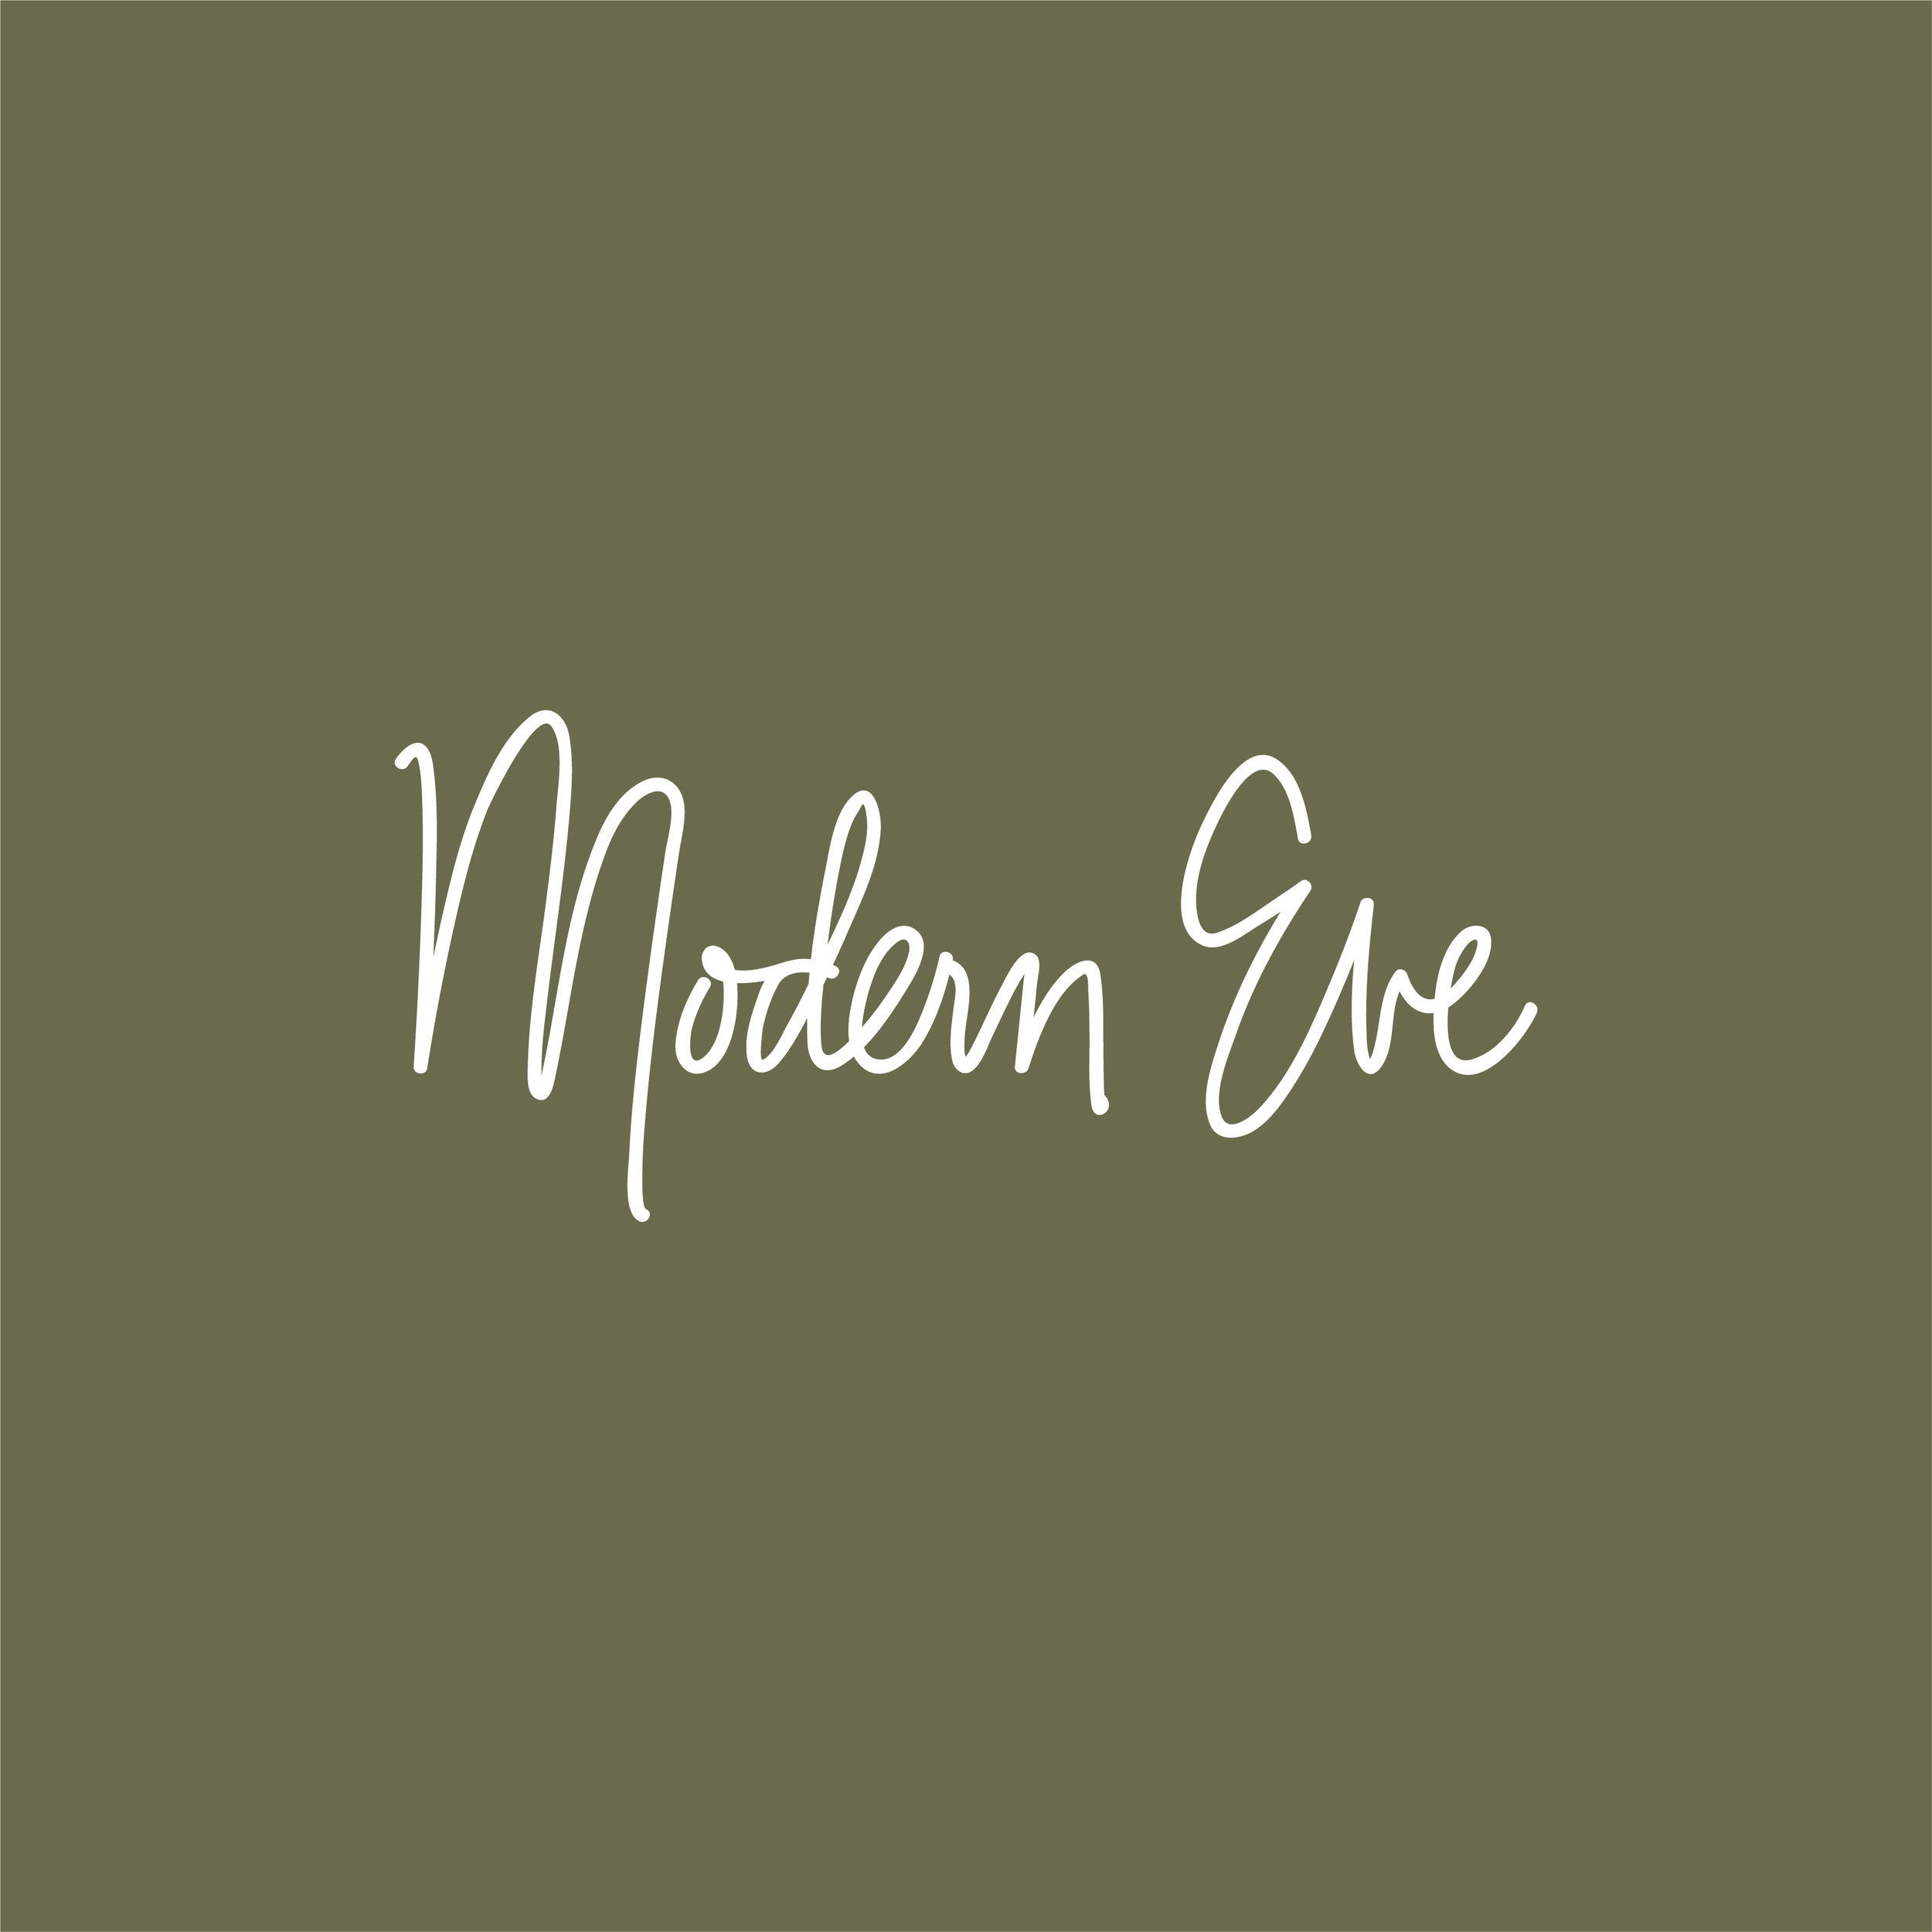 Modern Eve Logotype